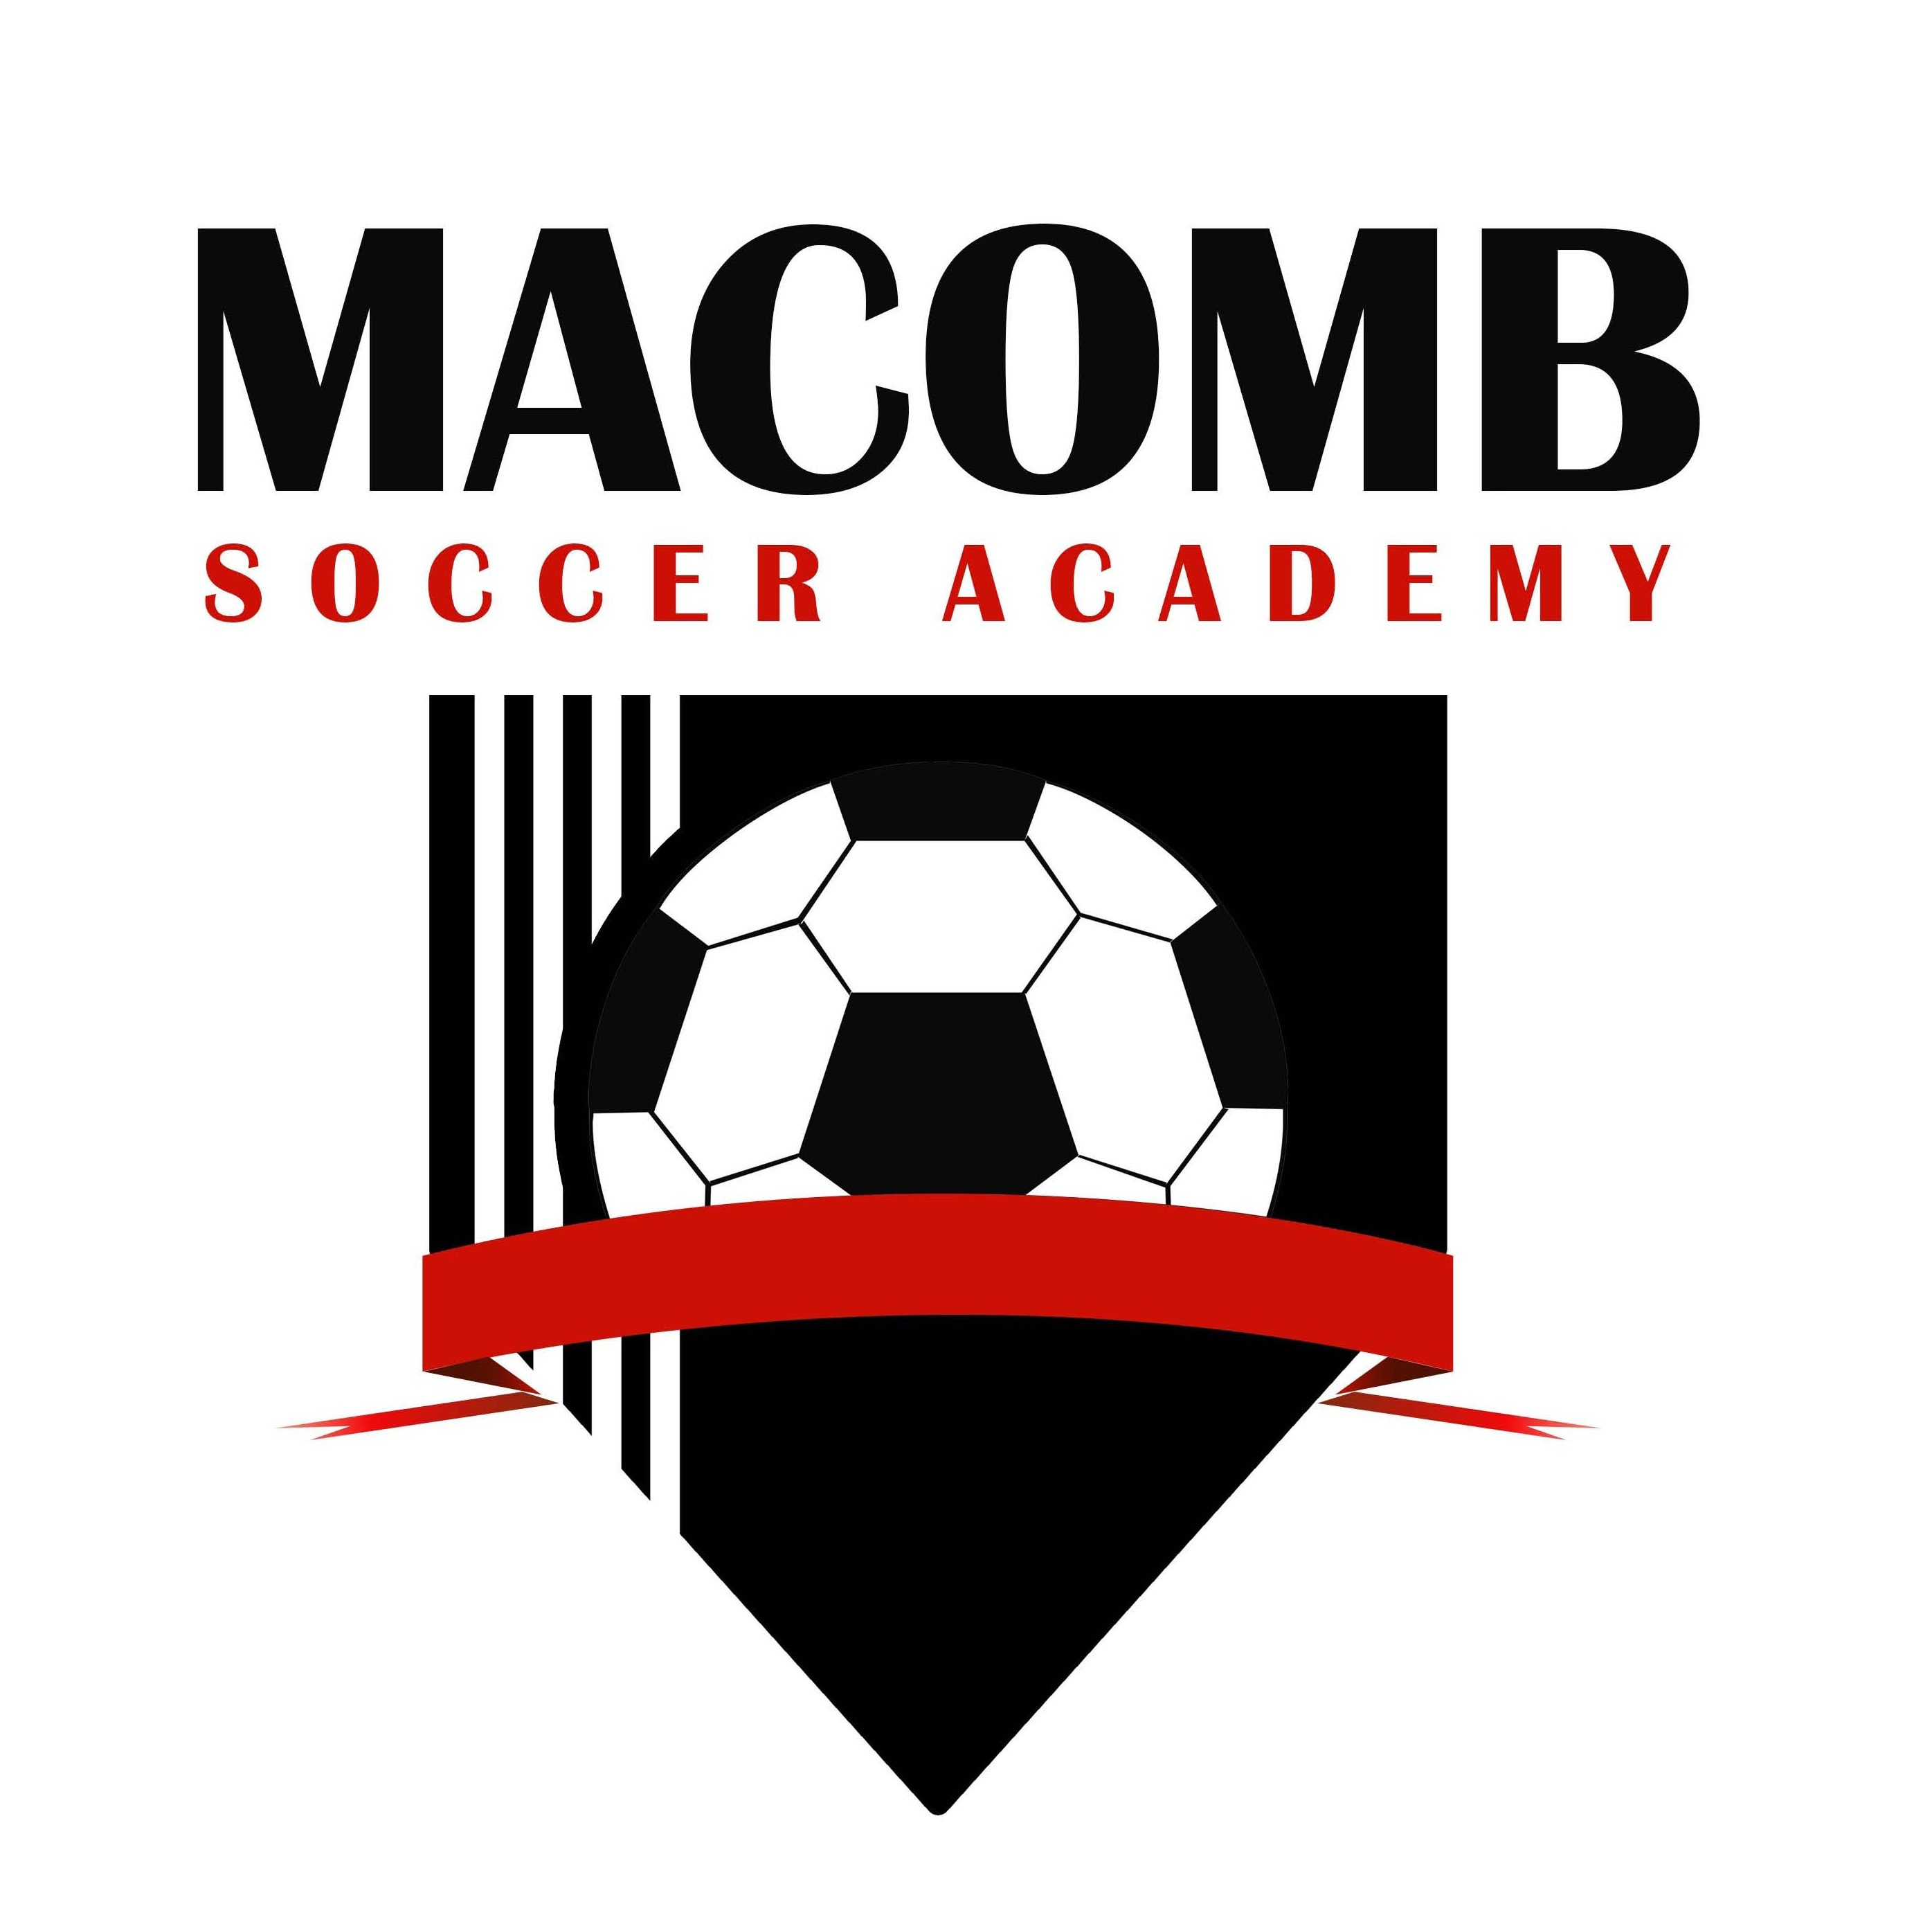 Macomb Soccer Academy